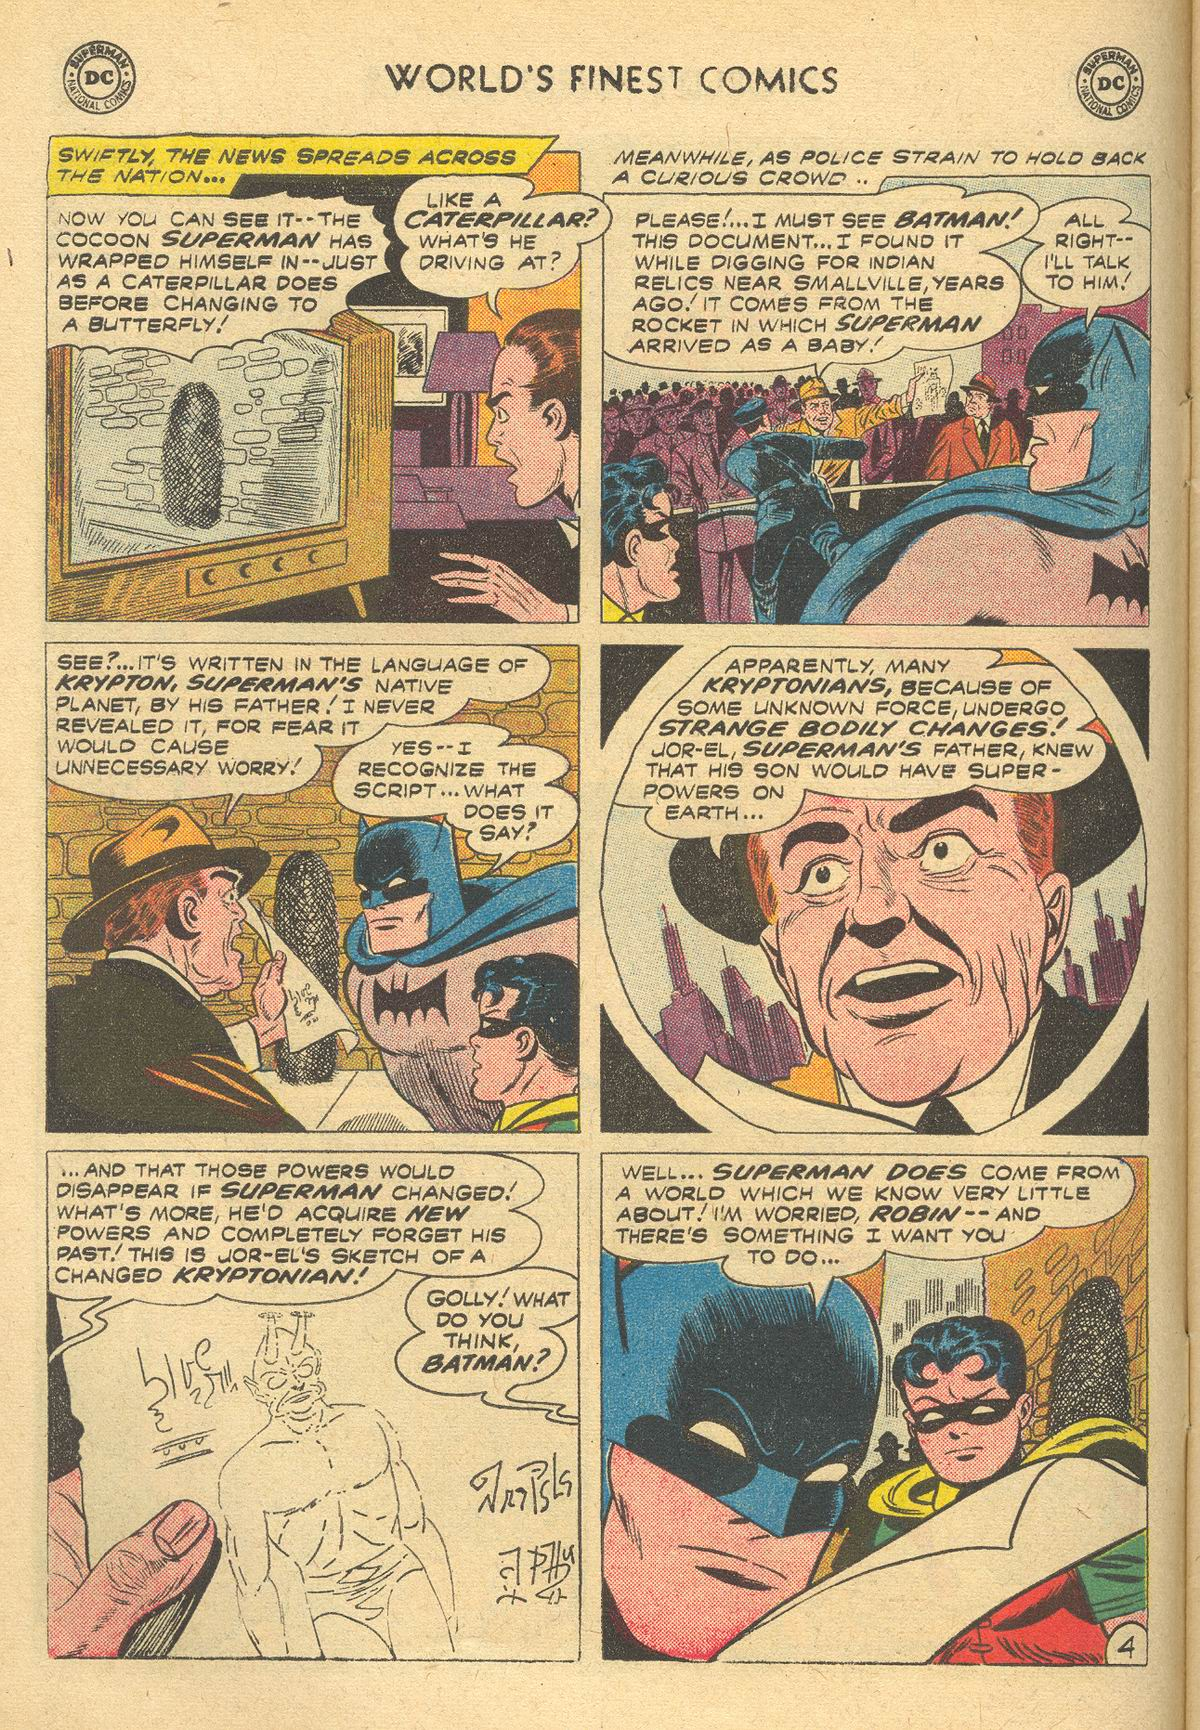 Read online World's Finest Comics comic -  Issue #105 - 6